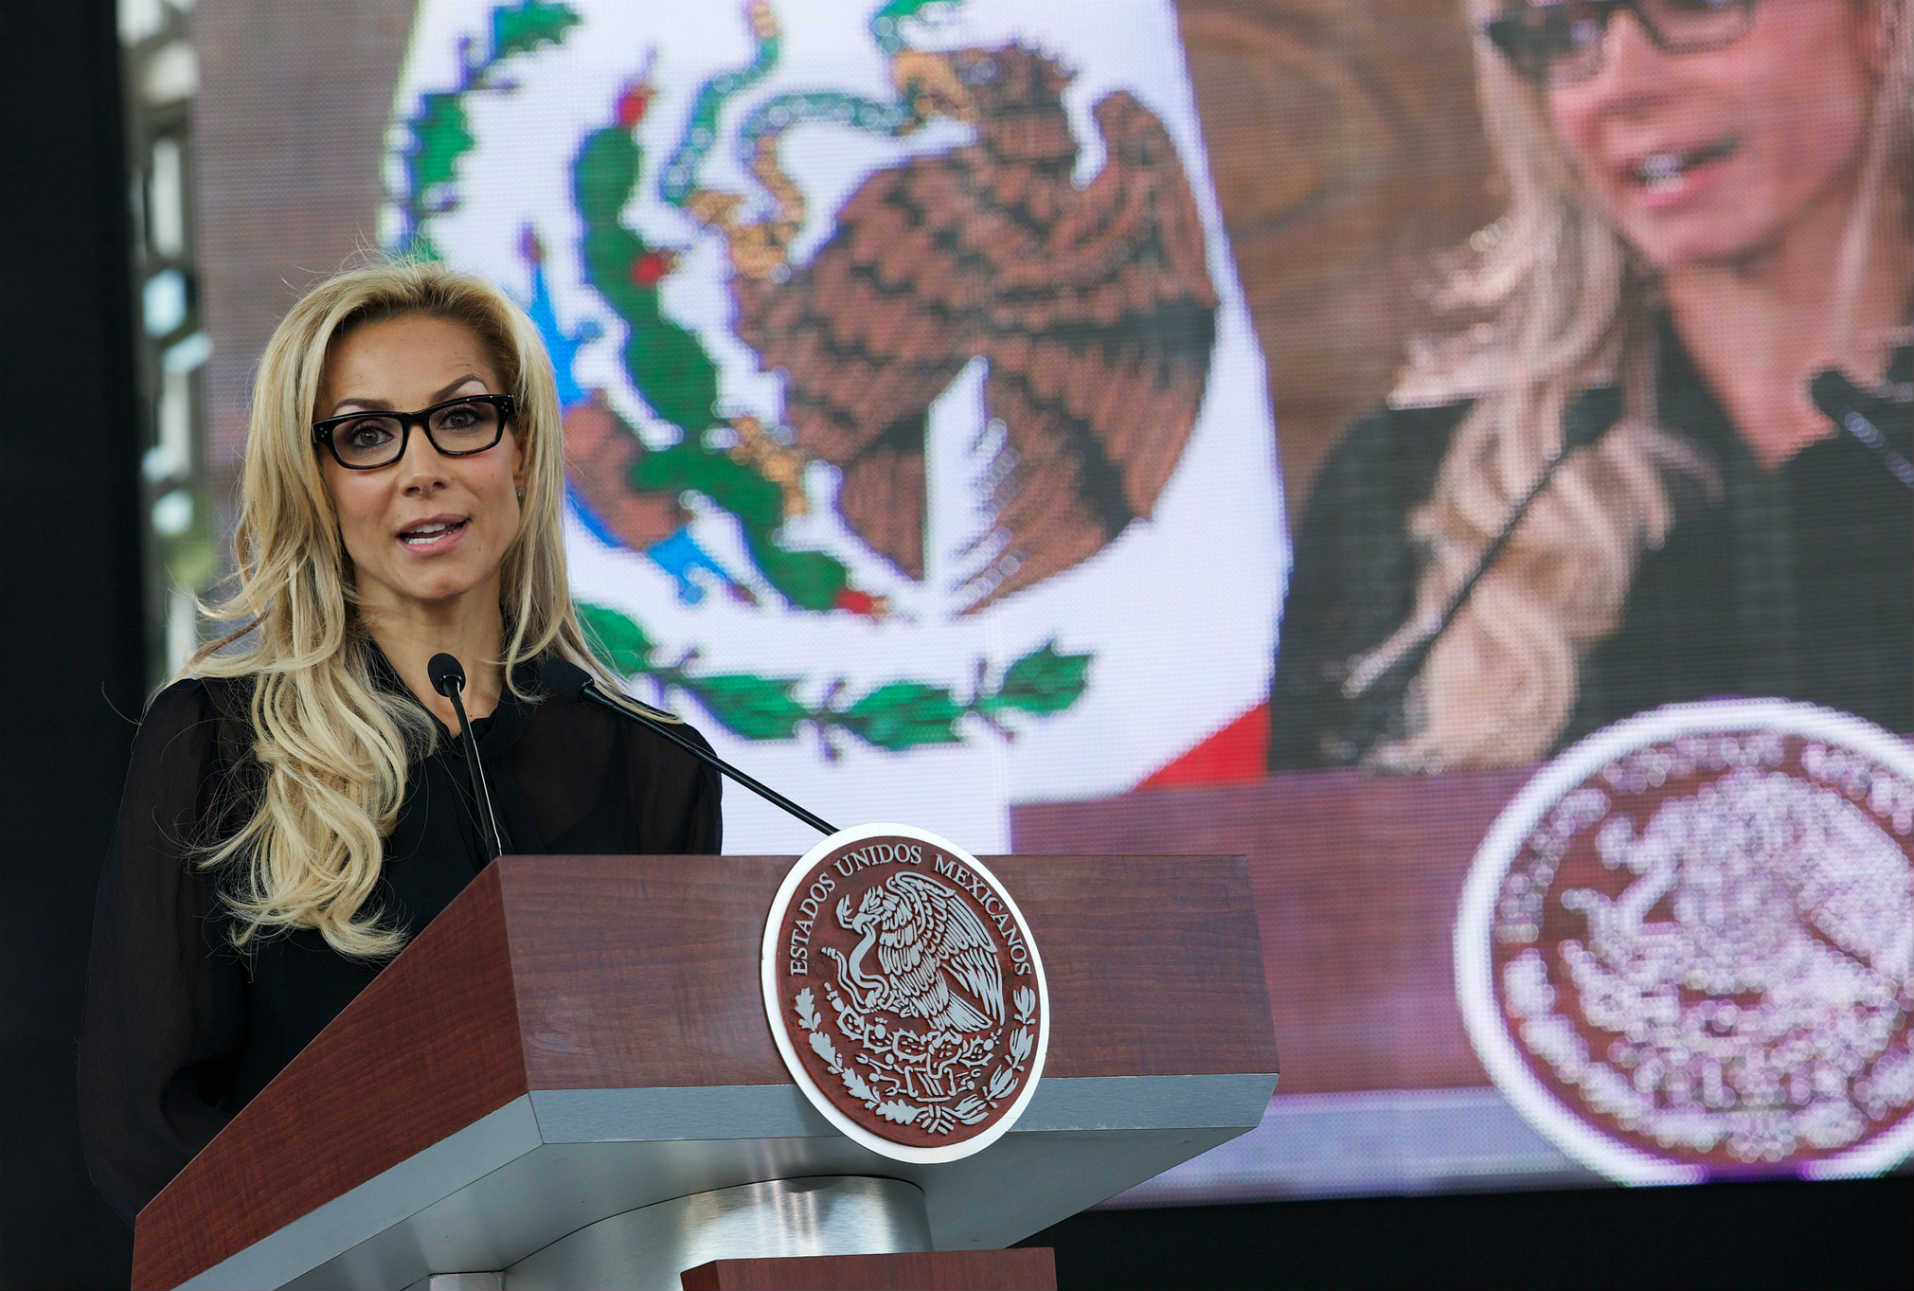 Pese a evidencia, coordinadora de la EDN desconoce compras de software de espionaje en México